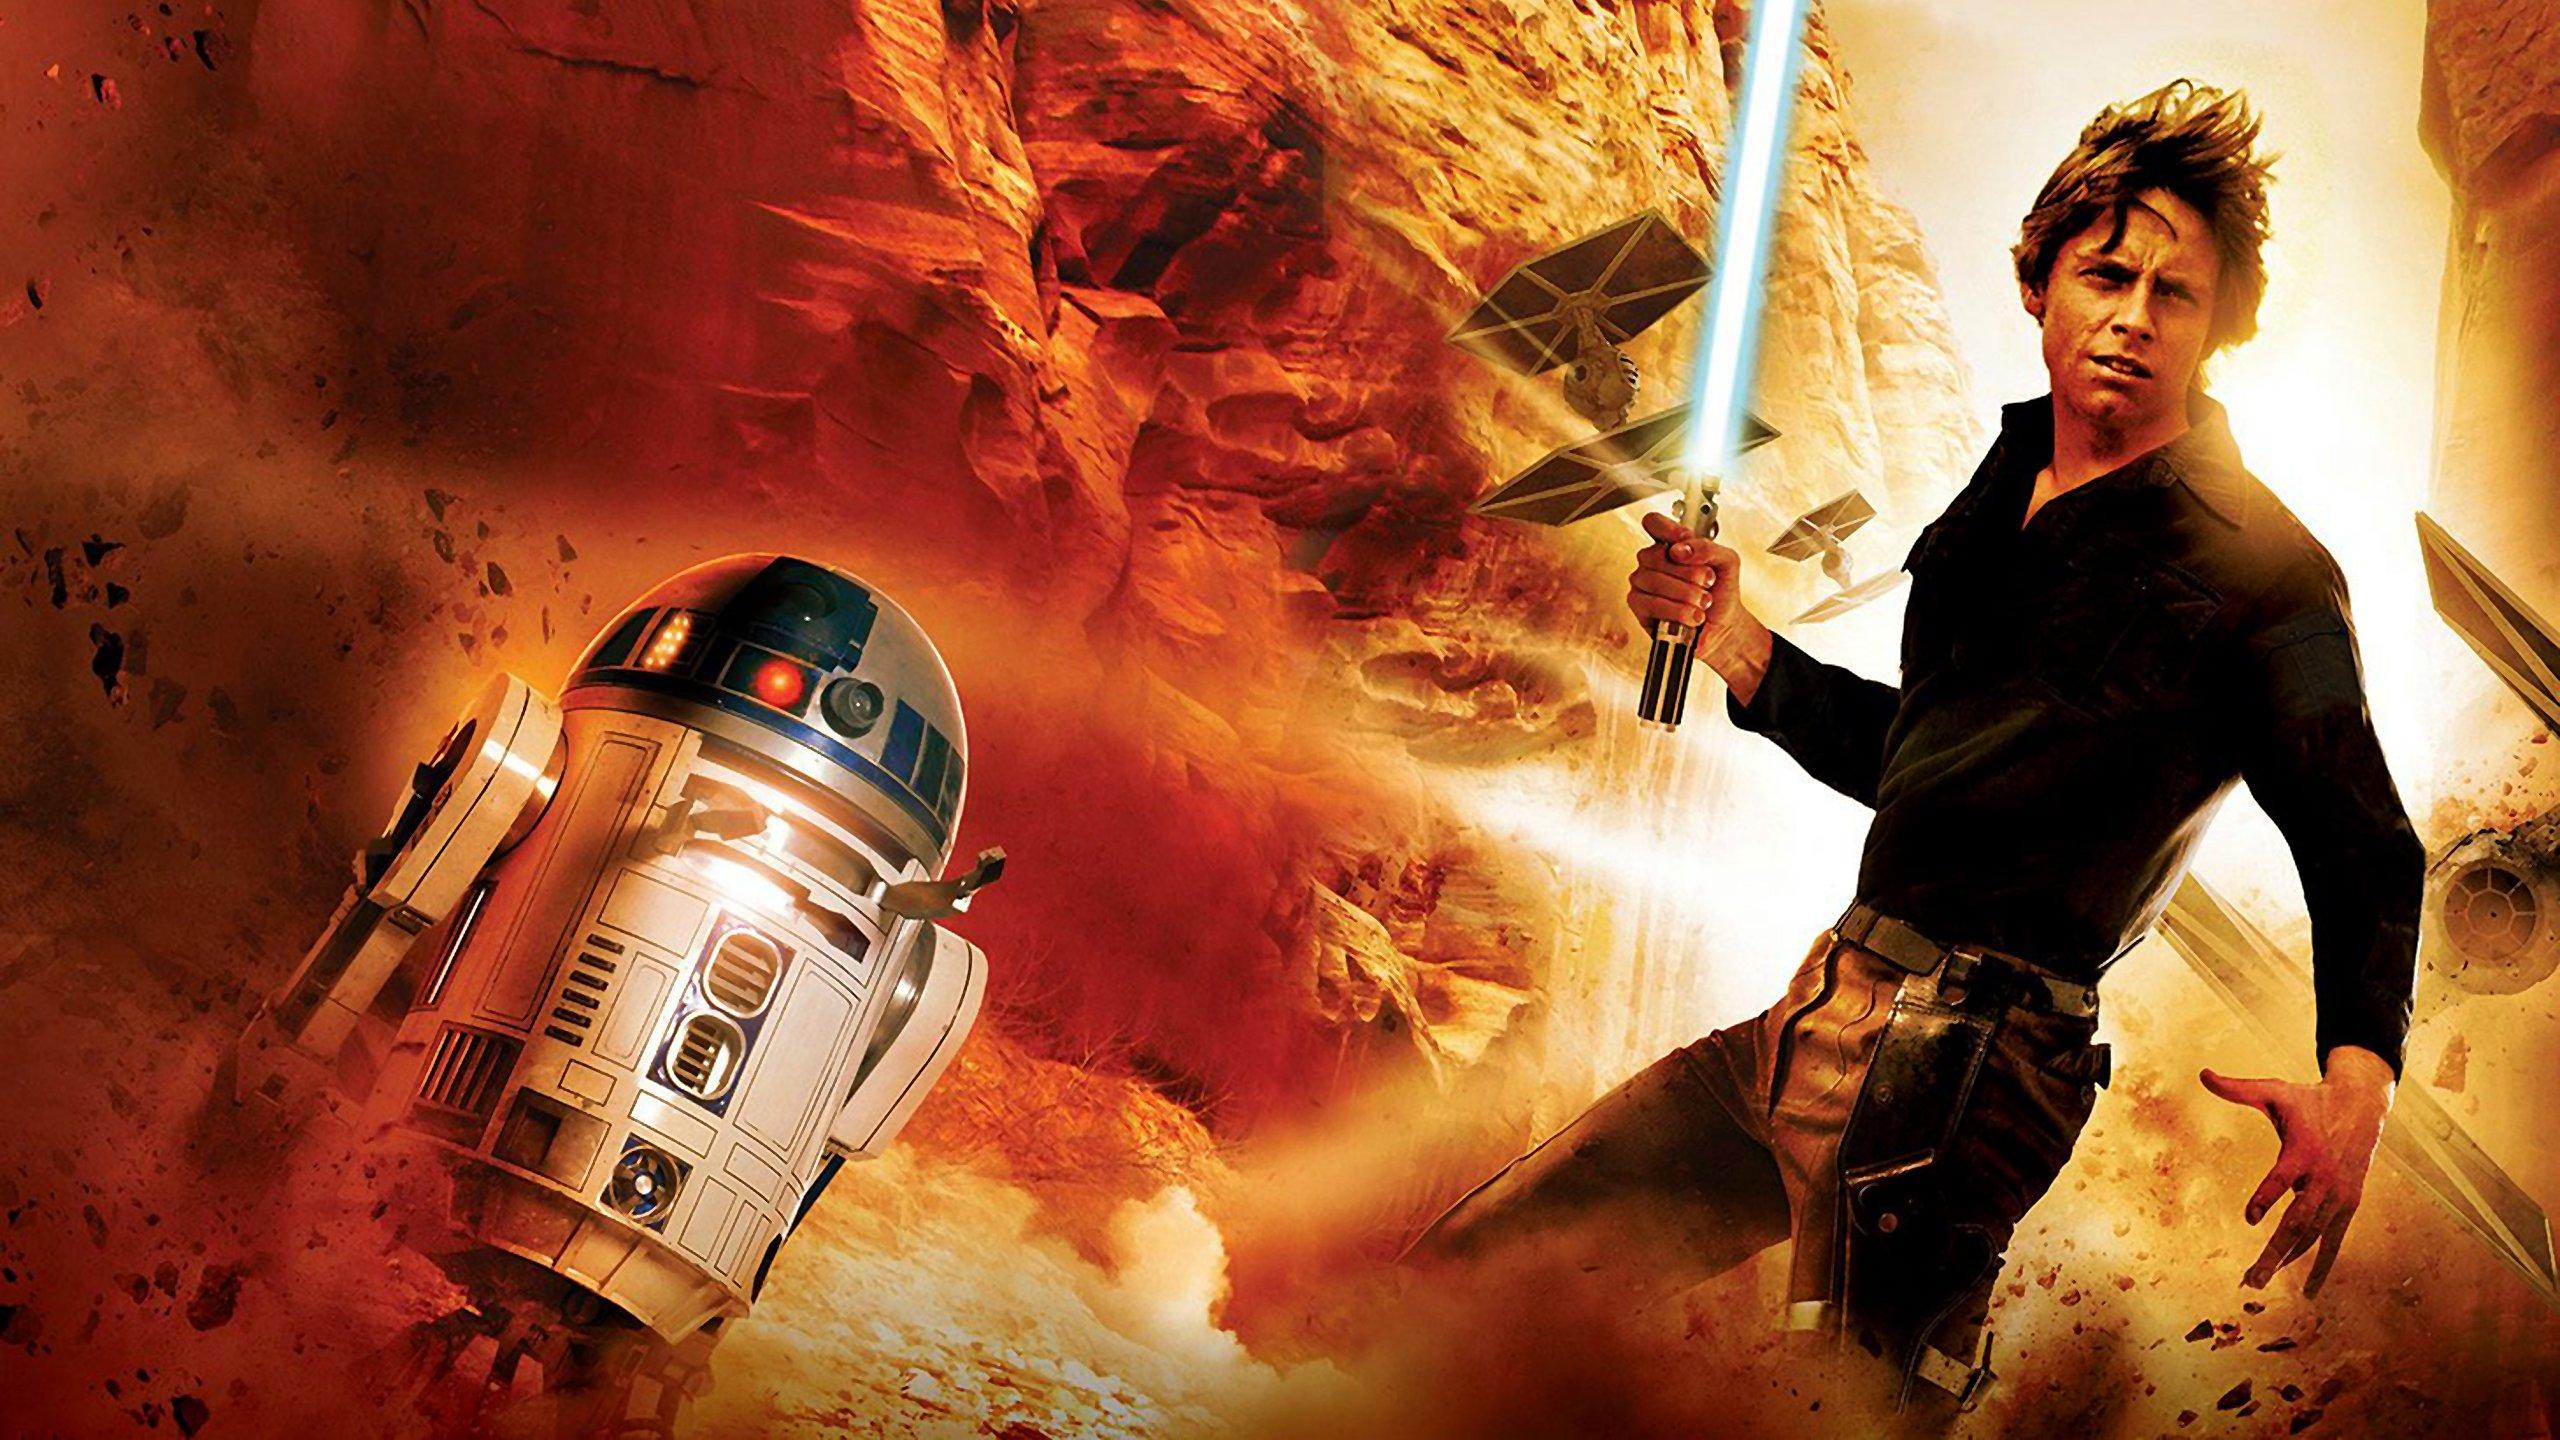 Star Wars Heir To The Jedi Wallpaper 2560x1440 629180 Wallpaperup